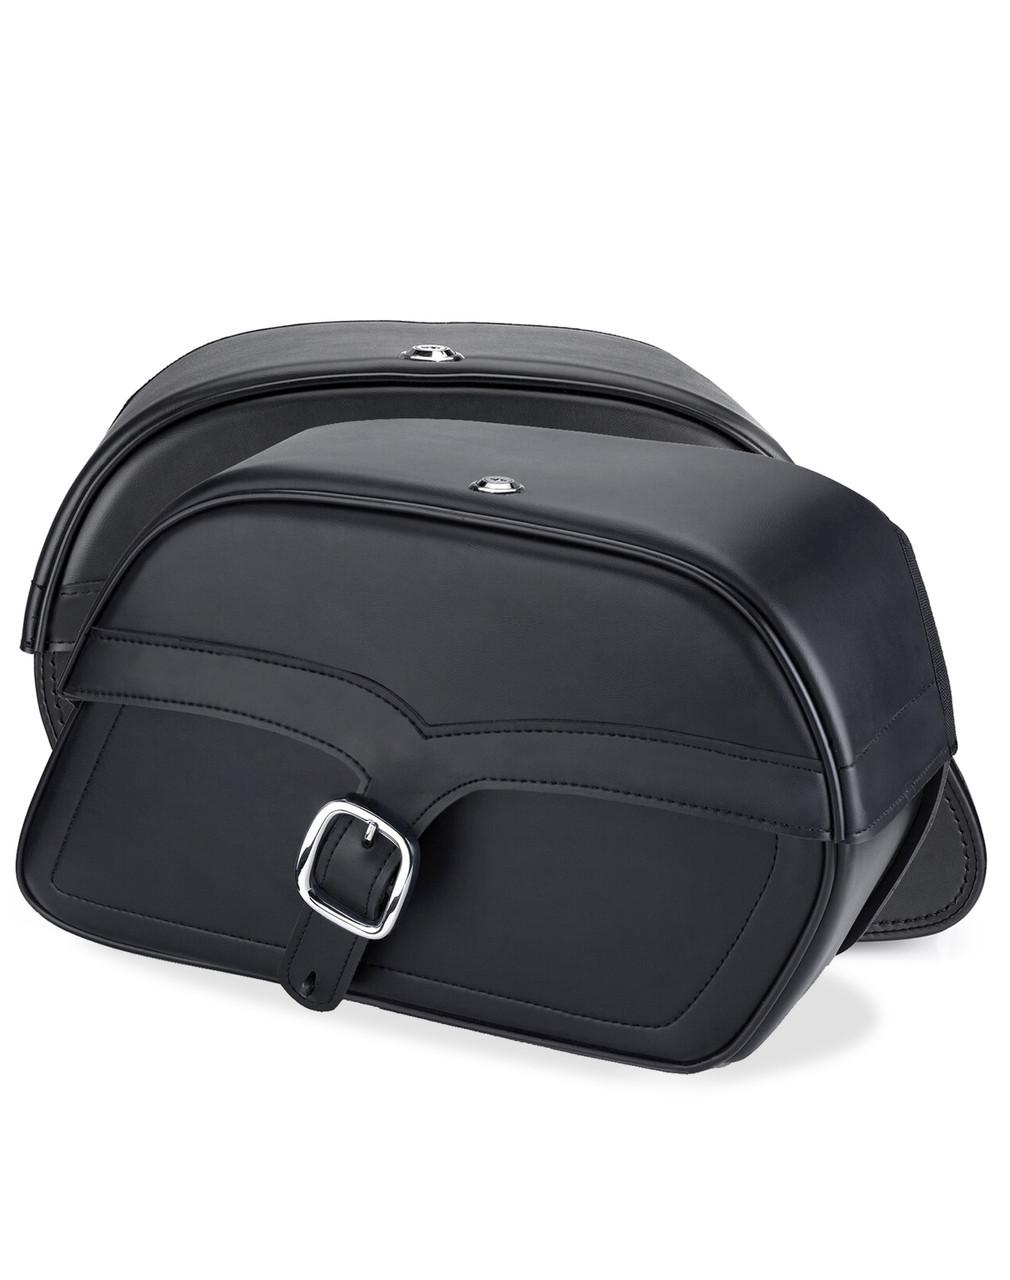 Honda 1500 Valkyrie Standard Vikingbags Shock Cutout Single Strap Large Slanted Leather Motorcycle Saddlebags Both Bags View